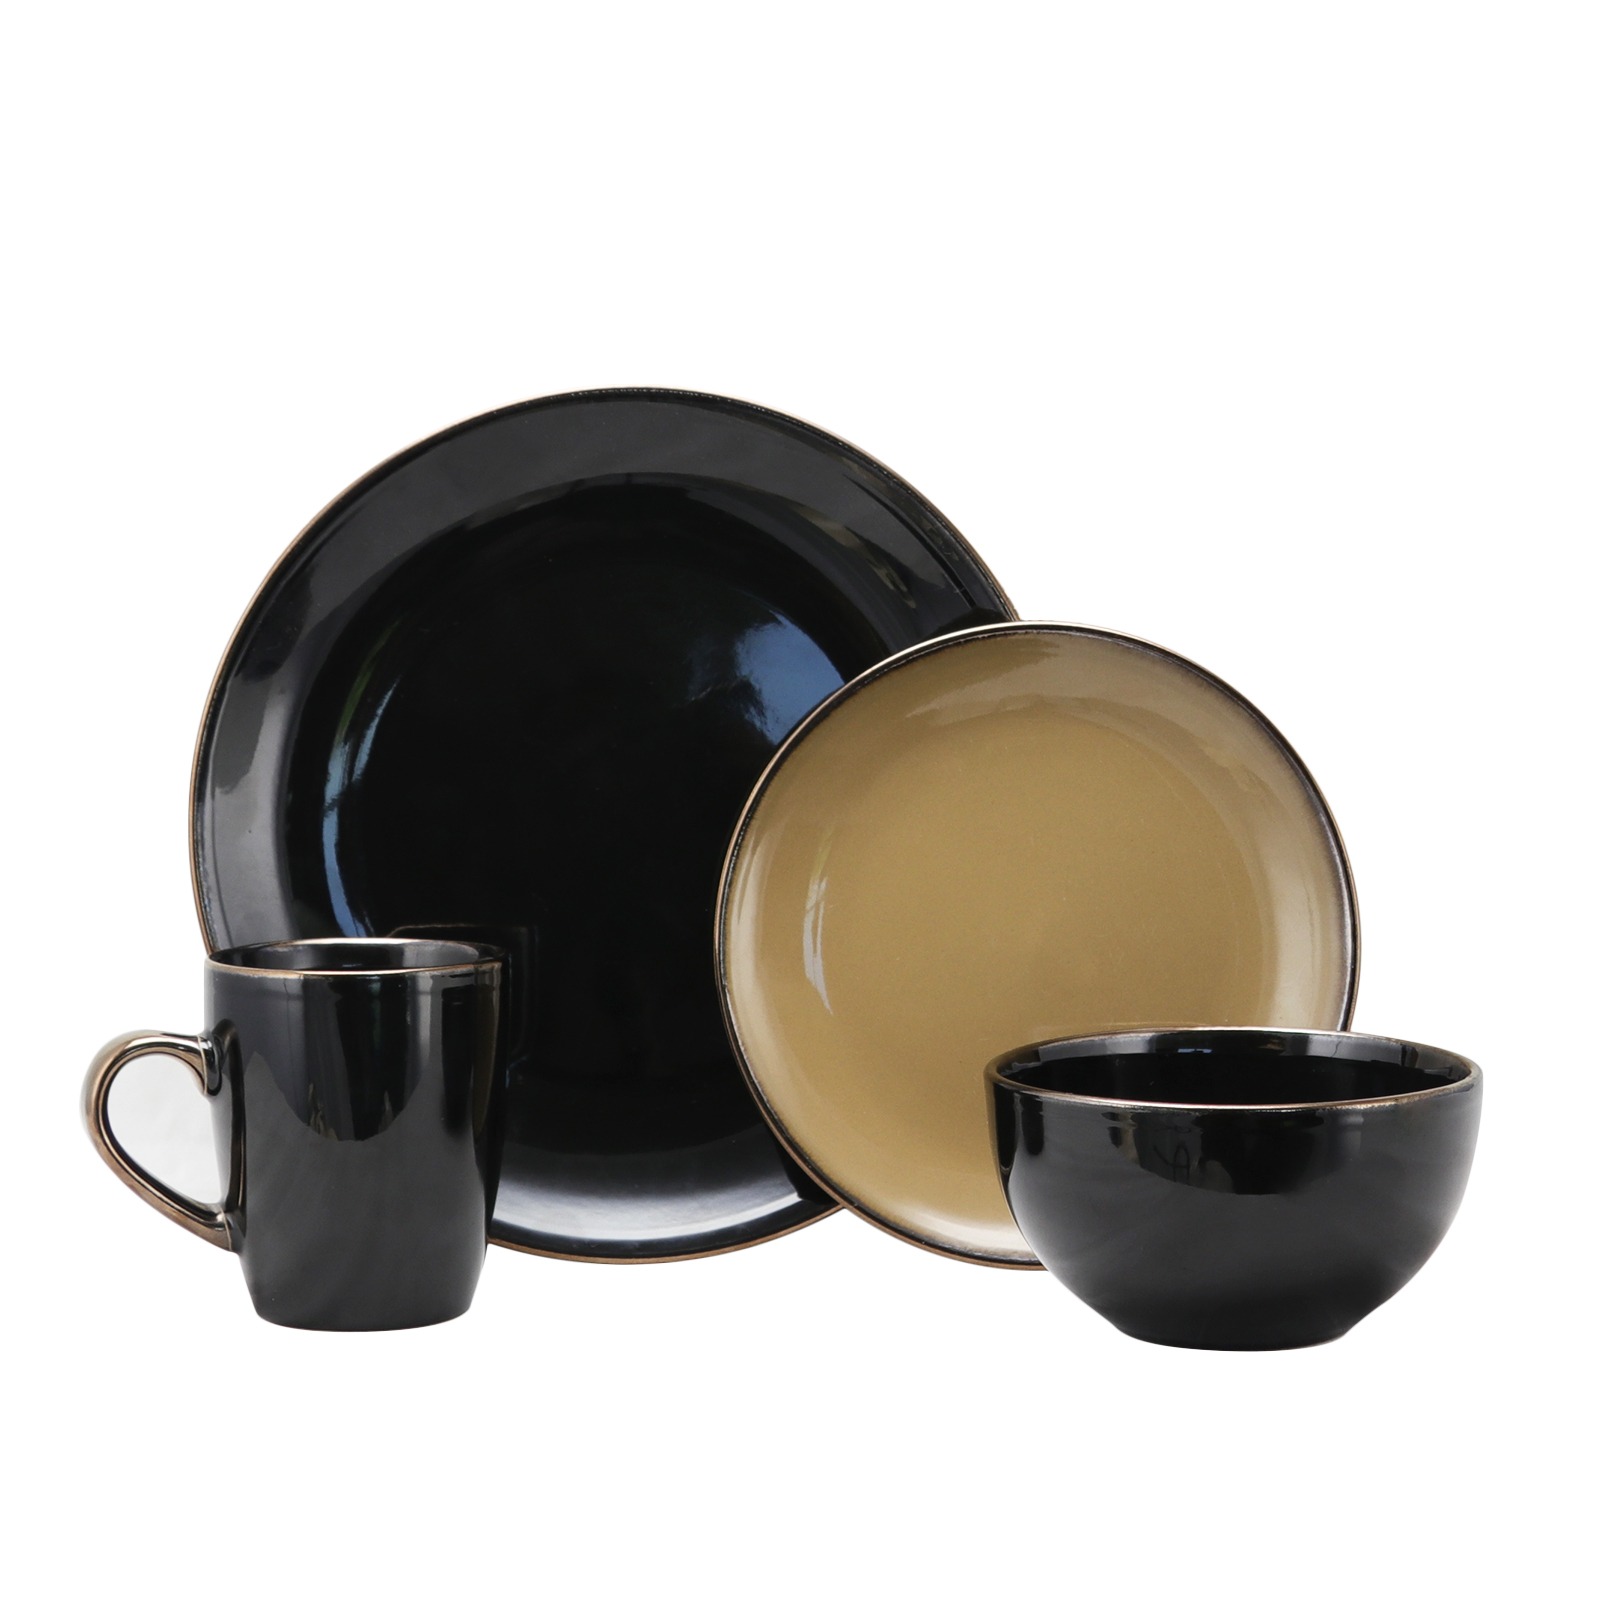 Image of Elama Cambridge Grand 16-Piece Dinnerware Set, Black/Warm Taupe